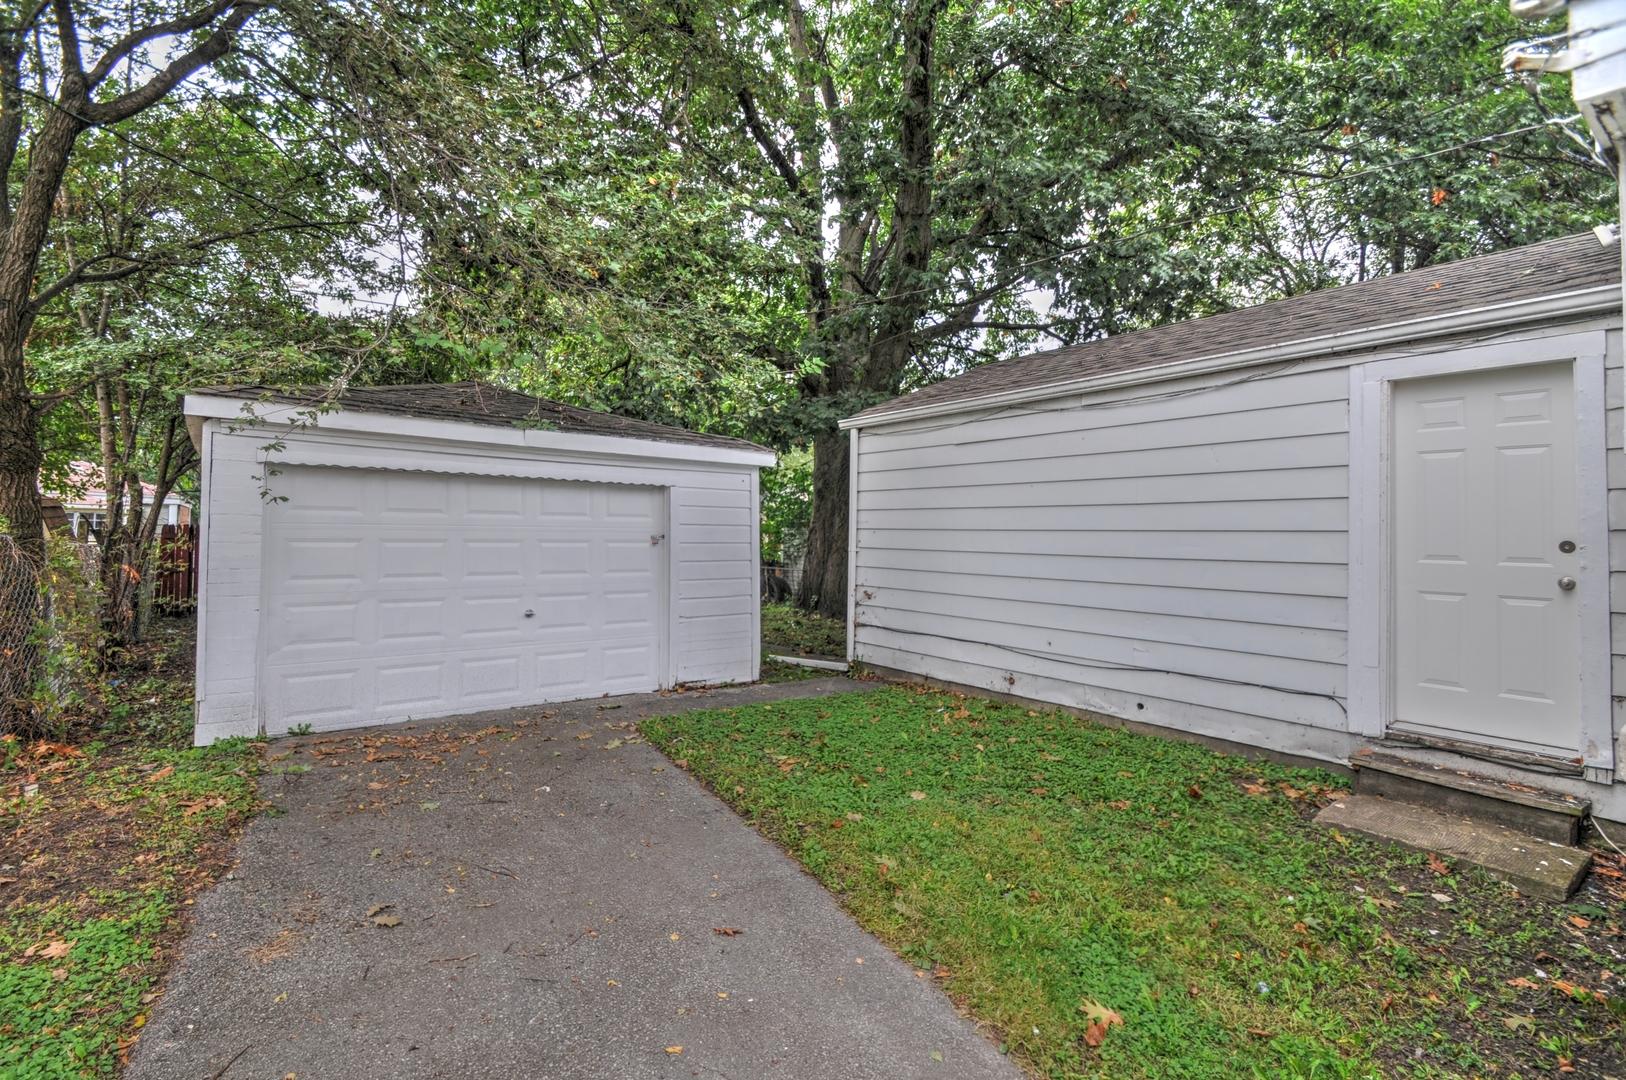 12616 South Ada, Calumet Park, Illinois, 60827